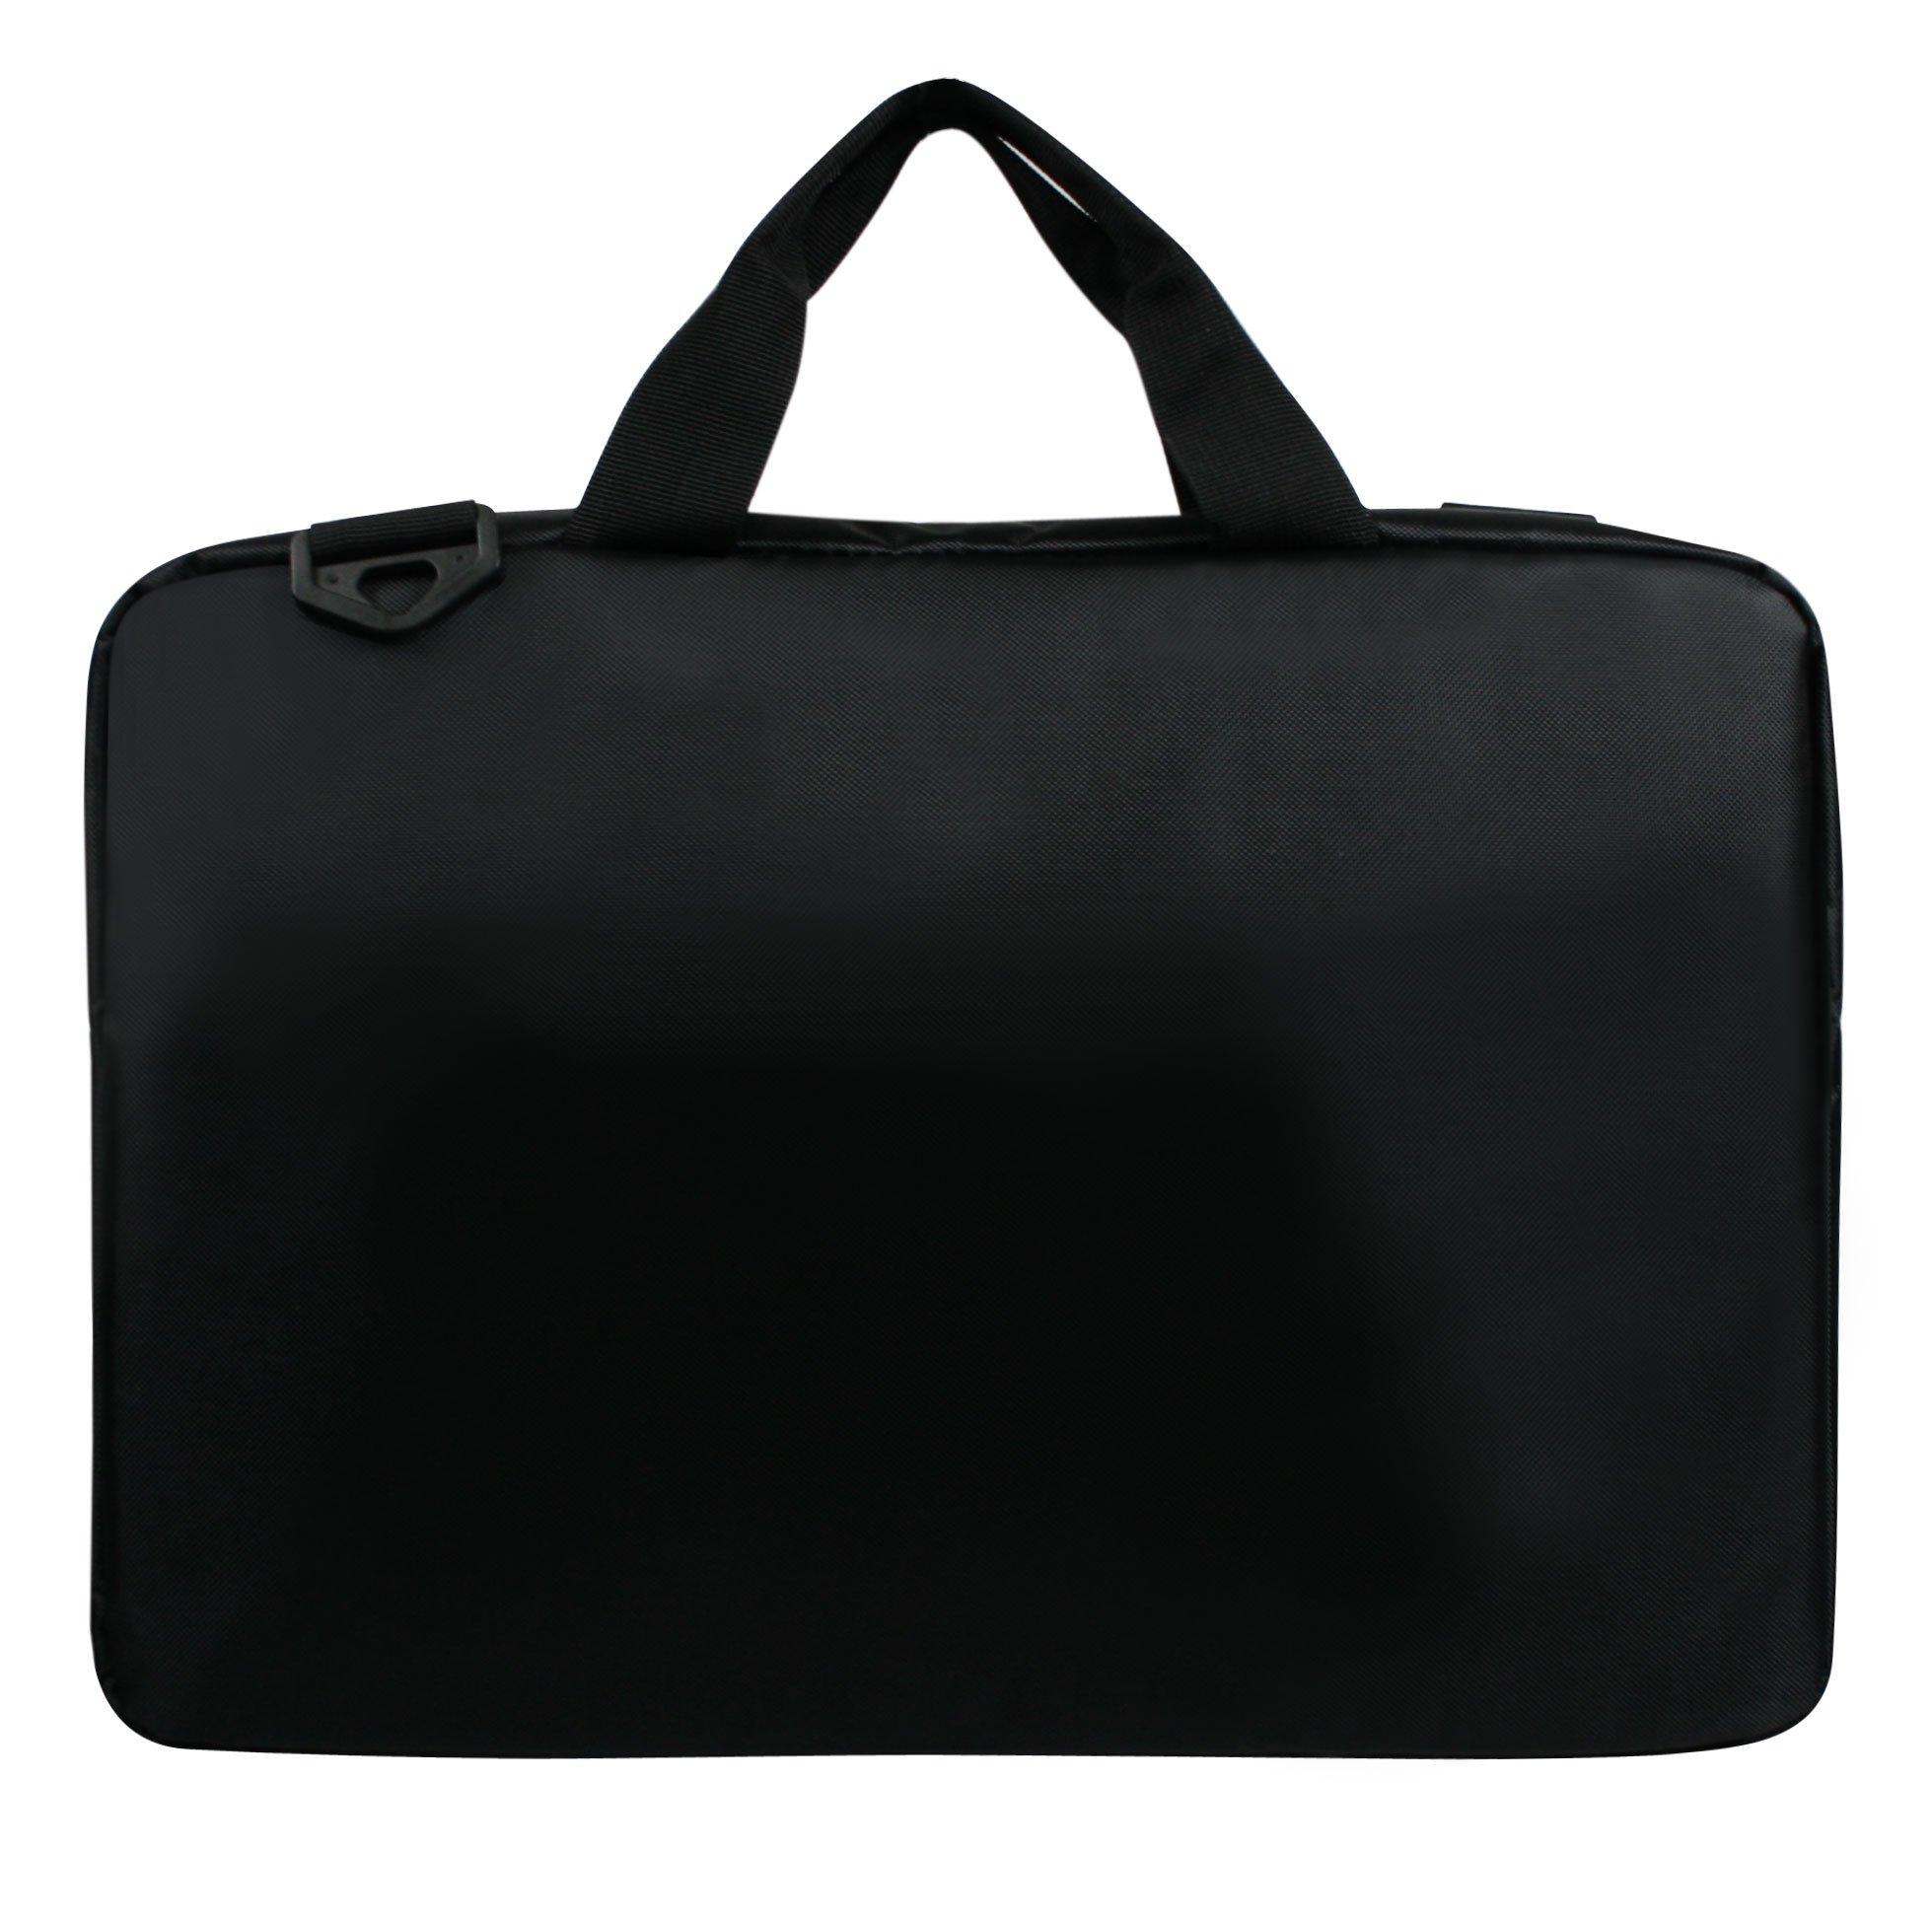 71jmQ2FqXBL - Port Designs 202310 maletines para portátil - Funda (Mochila, Negro, Monótono, Nylon, Resistente al Polvo, Resistente a rayones)